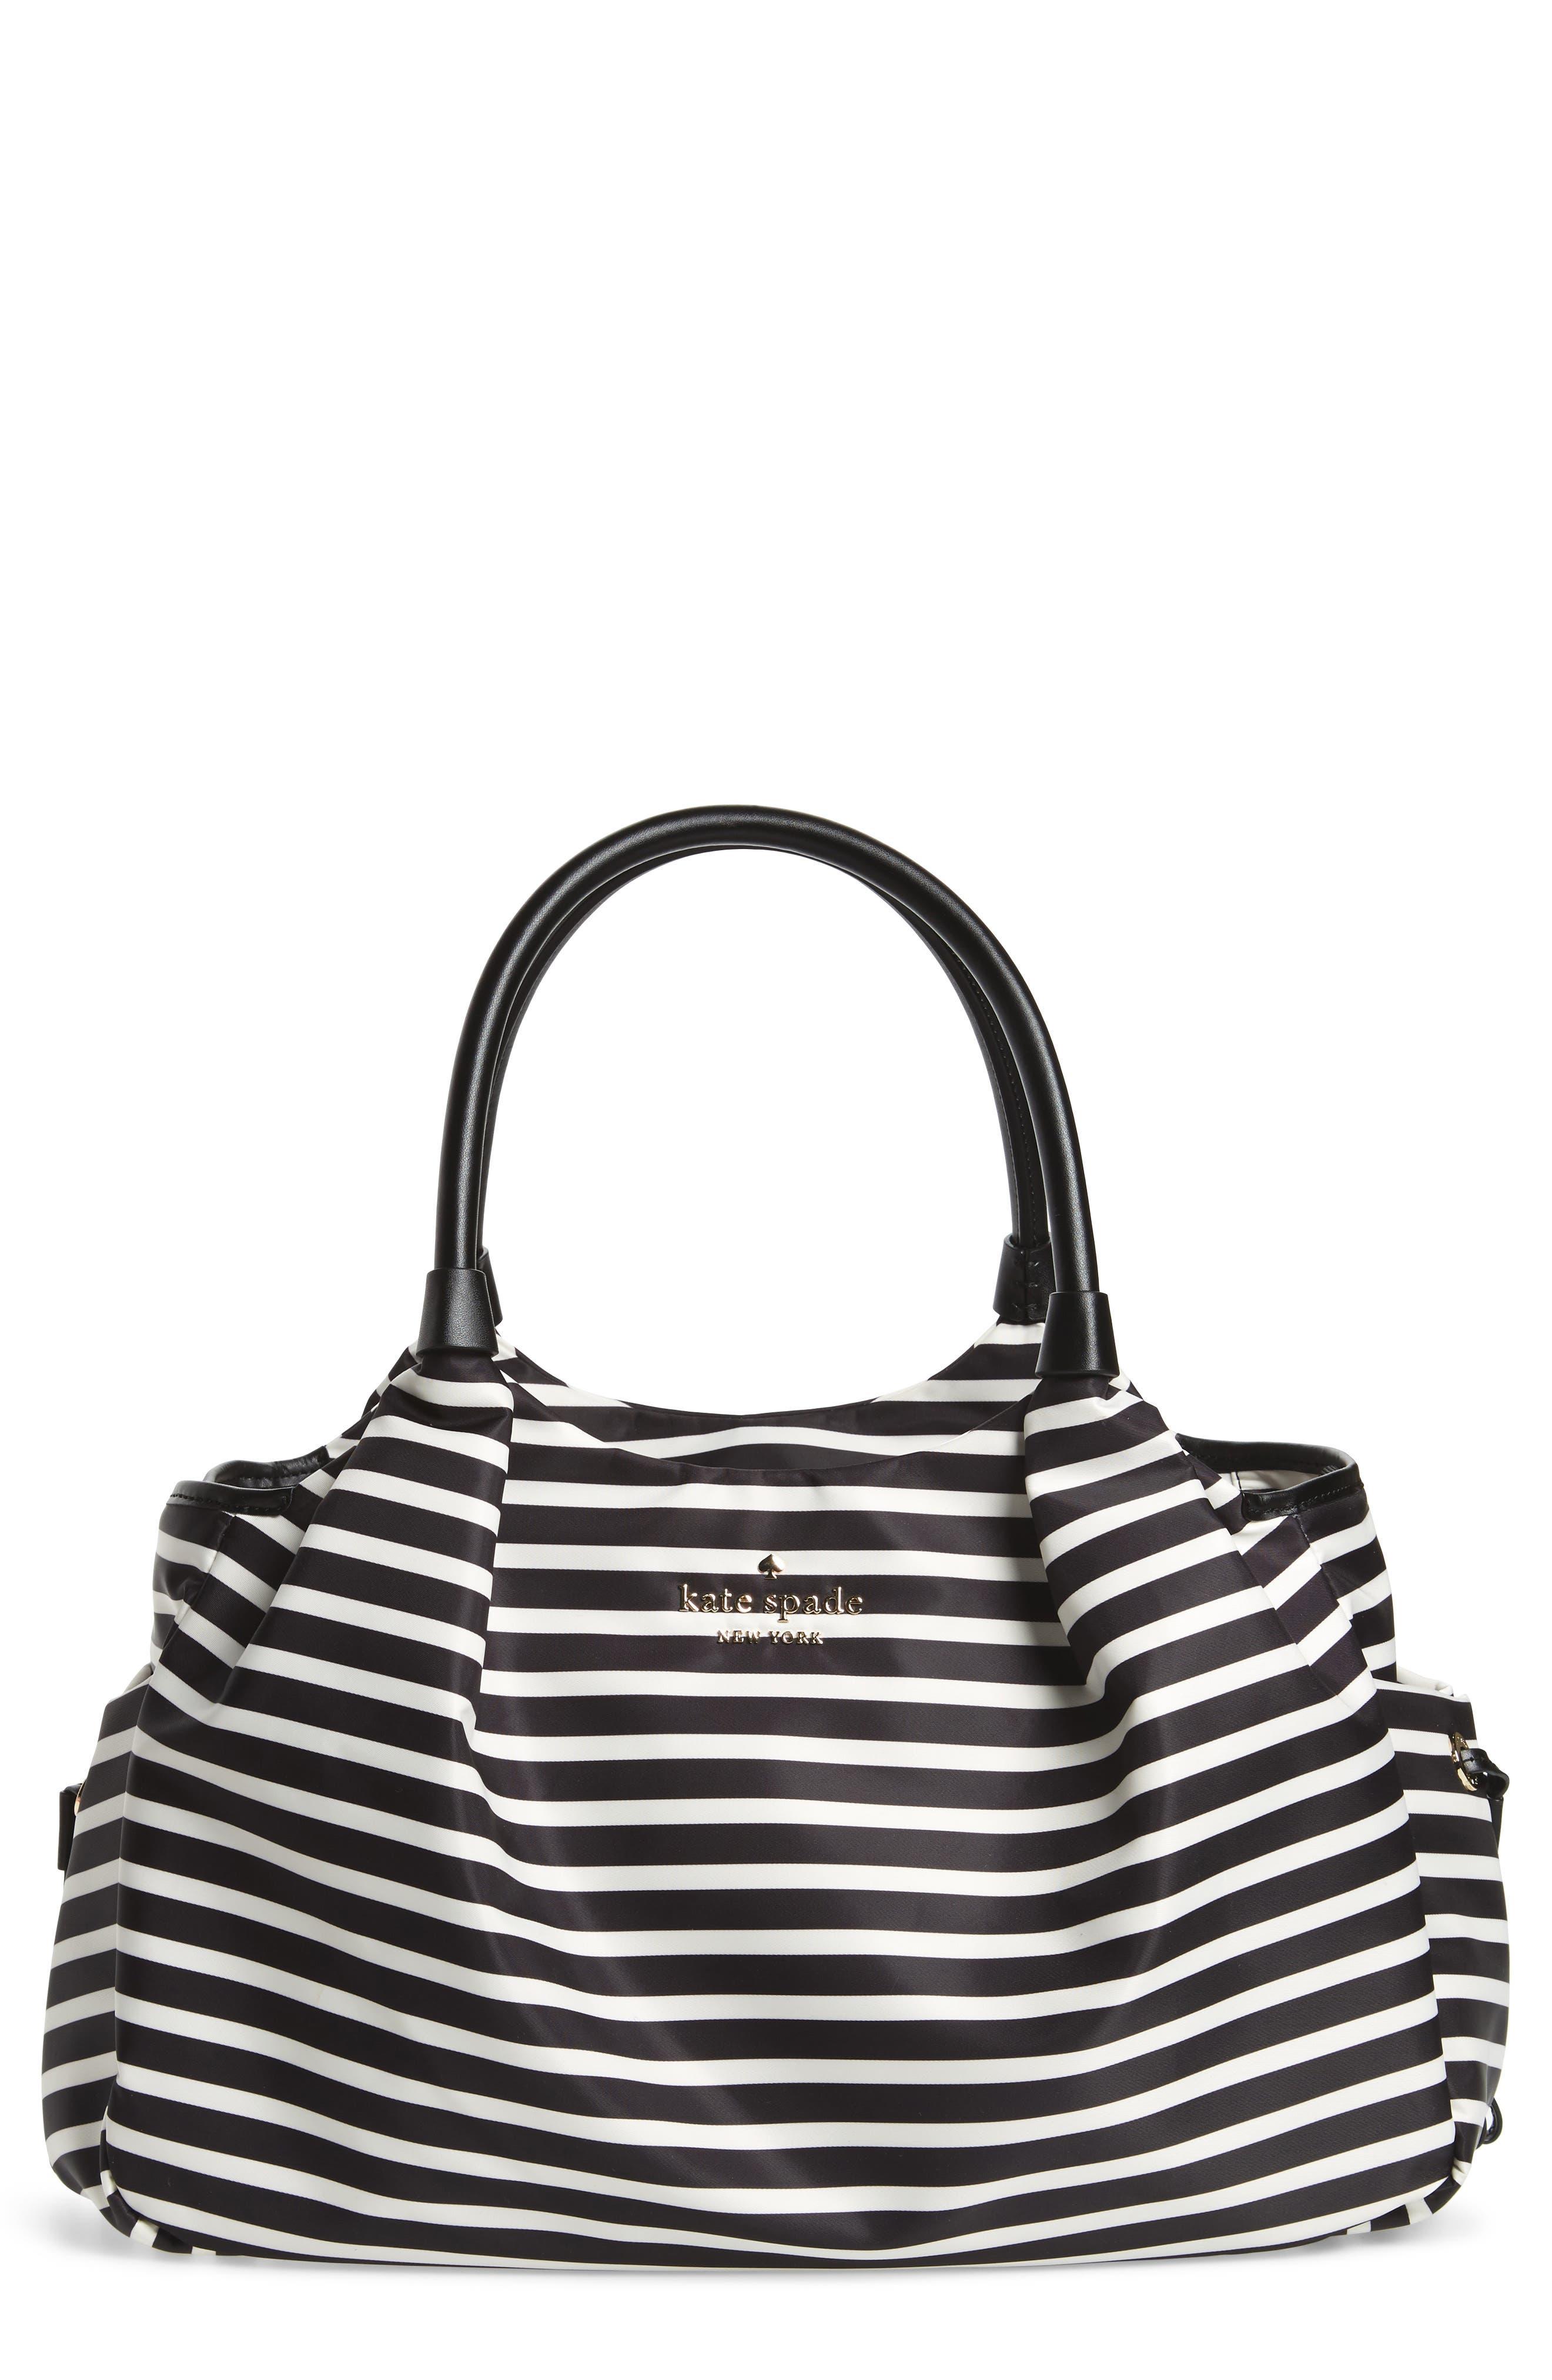 watson lane - stevie diaper bag,                             Main thumbnail 1, color,                             BLACK/ CLOTTED CREAM